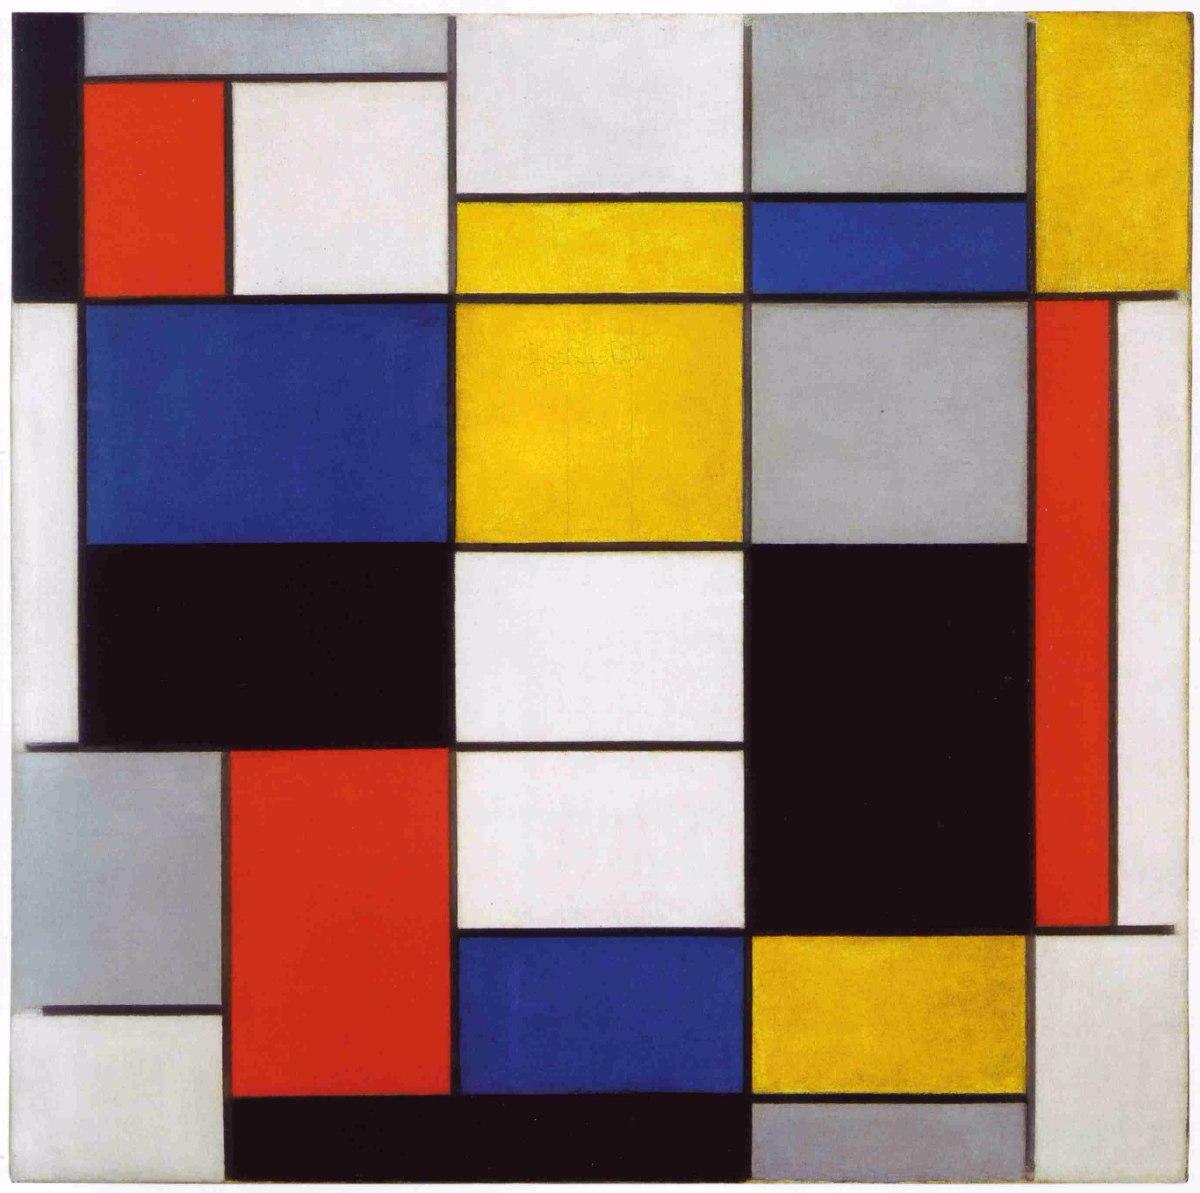 Lienzo tela composici n a piet mondrian arte abstracto - Composicion cuadros ...